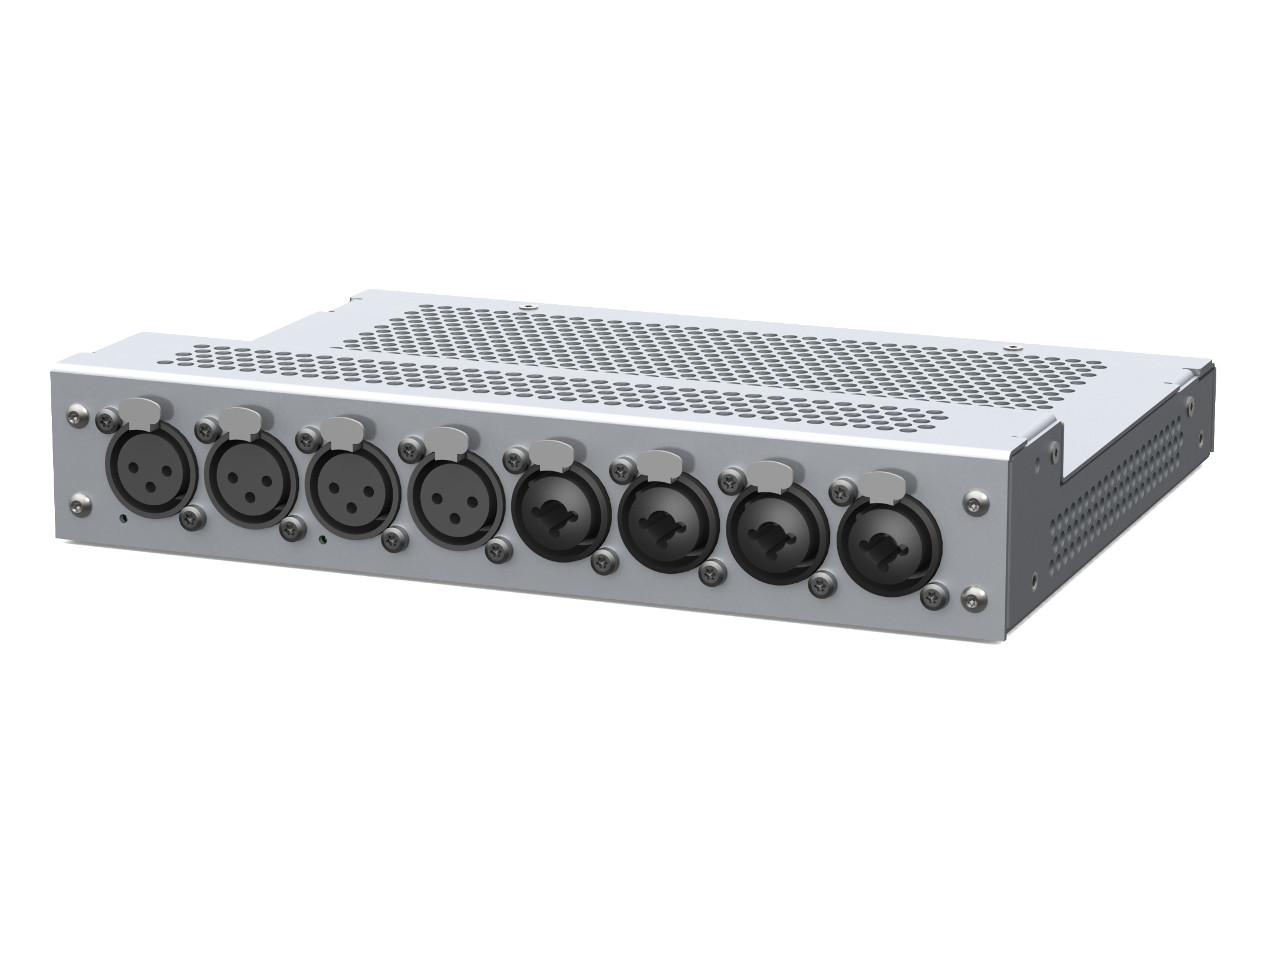 52 7235a Xc Mic Headphone Module Modular Audio Preamplifier